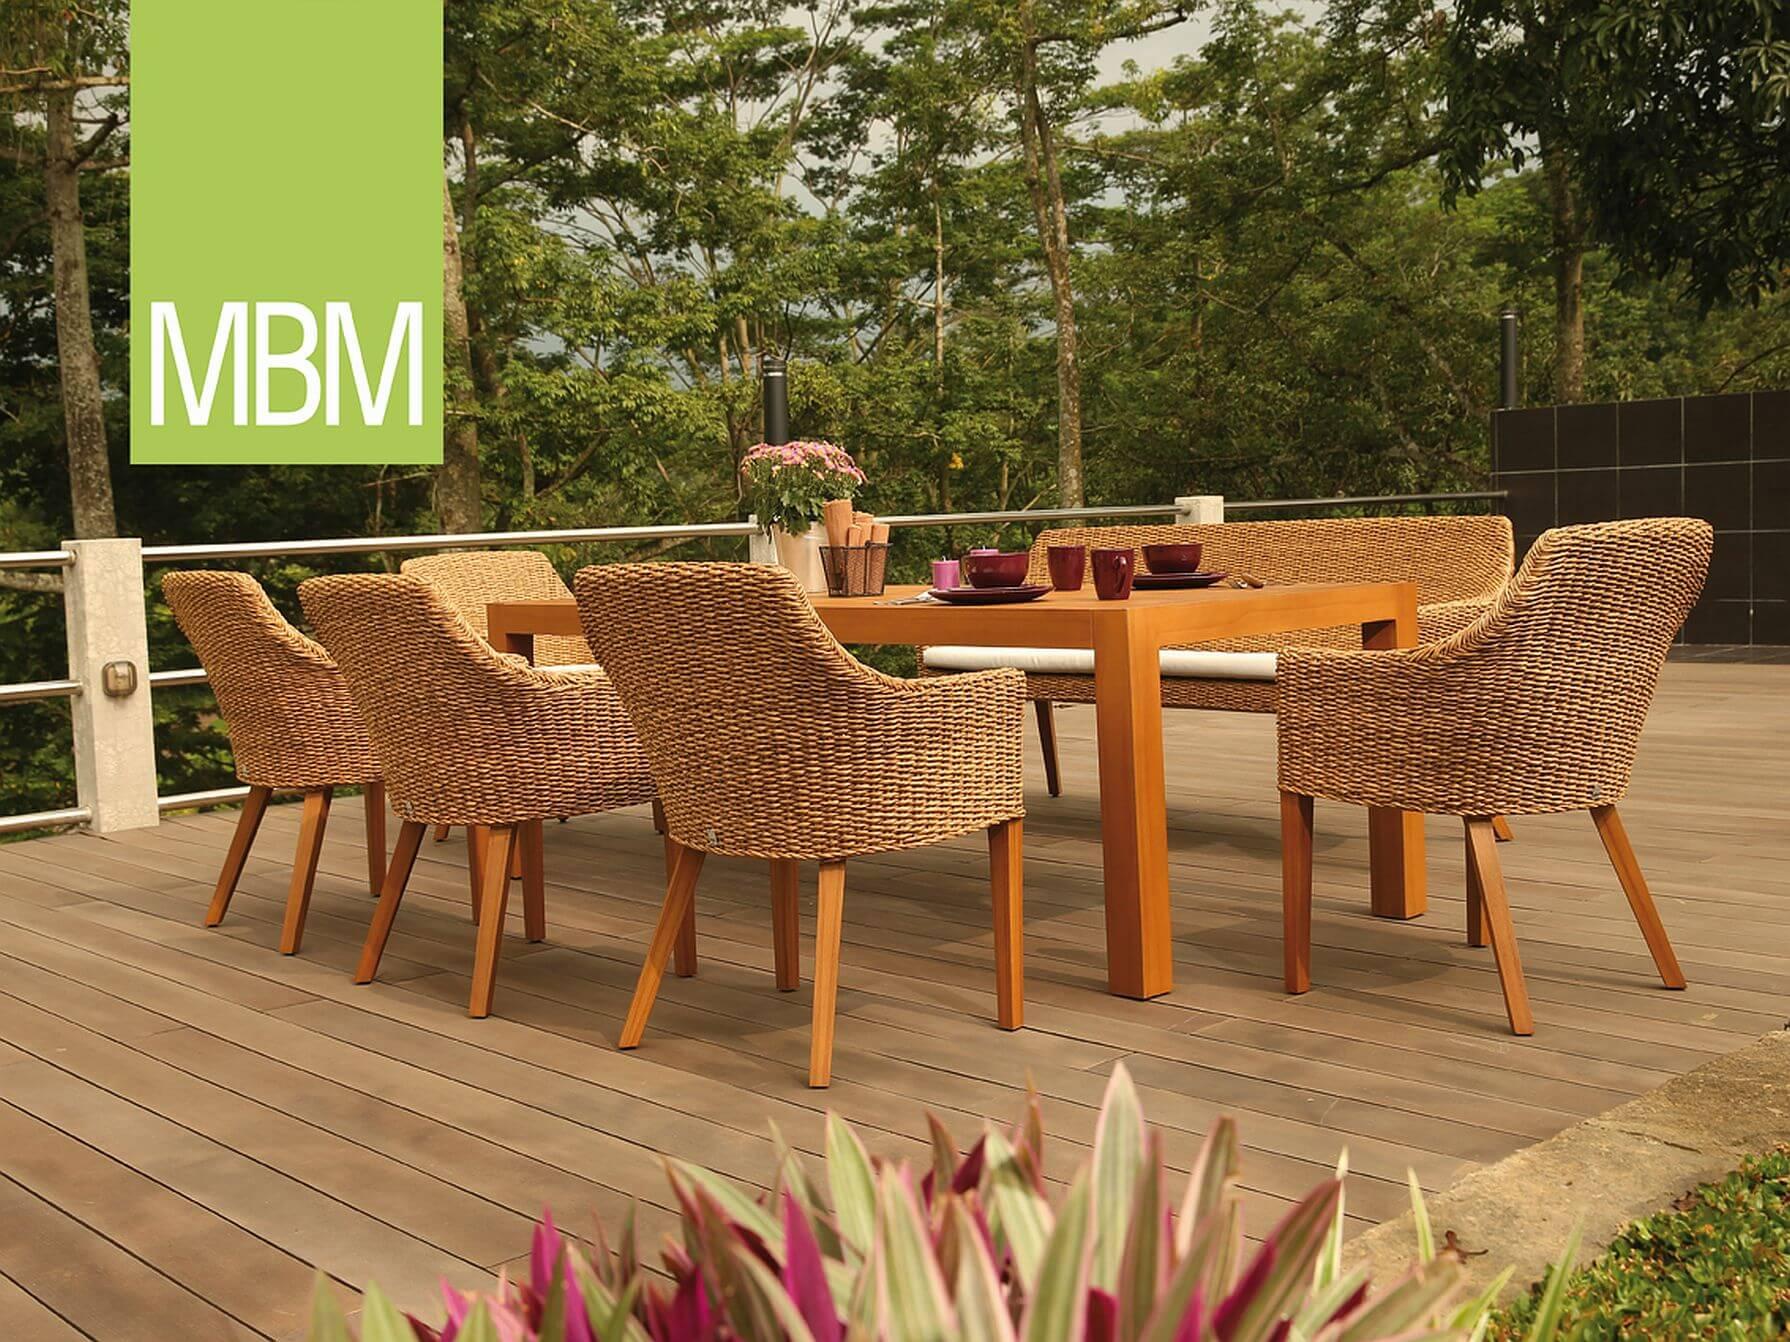 mbm mirotex twist resysta sitzgruppe tortuga twist 8 personen too design gartenm bel. Black Bedroom Furniture Sets. Home Design Ideas